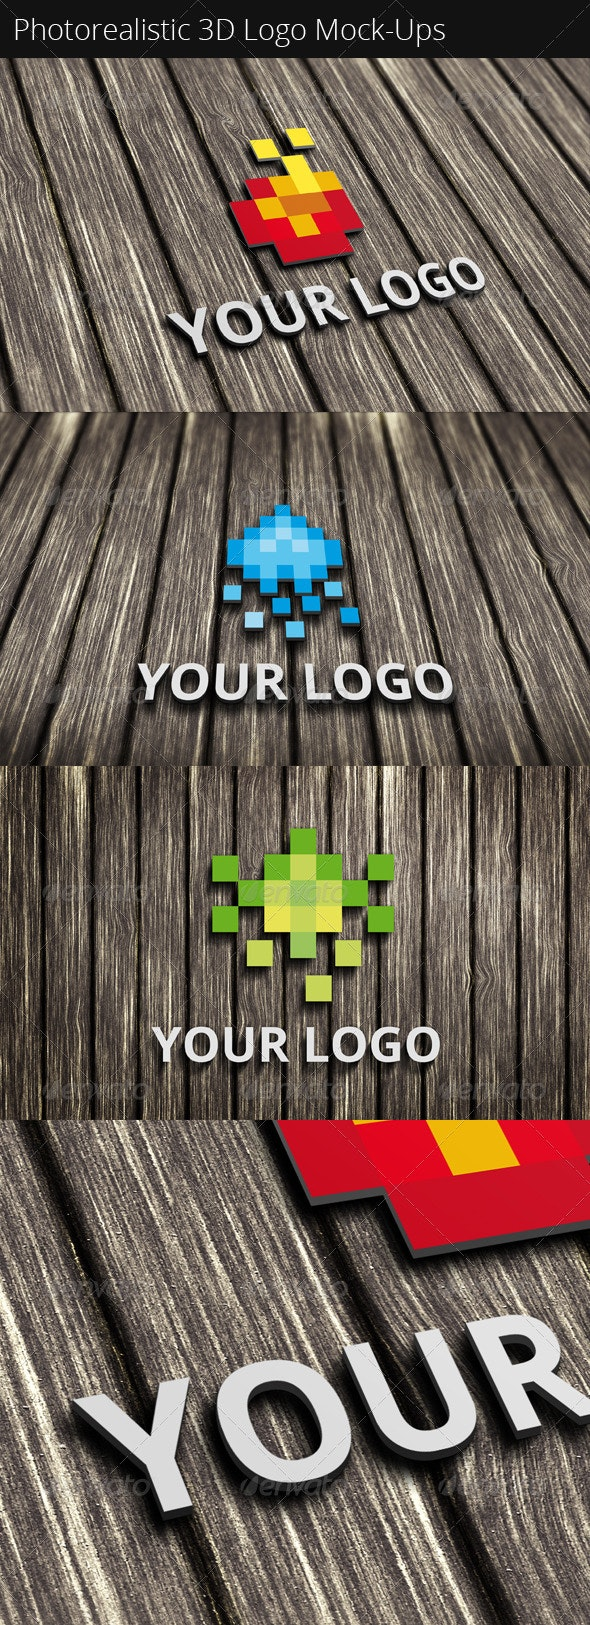 Photorealistic 3D Logo Mock-Ups - Logo Product Mock-Ups